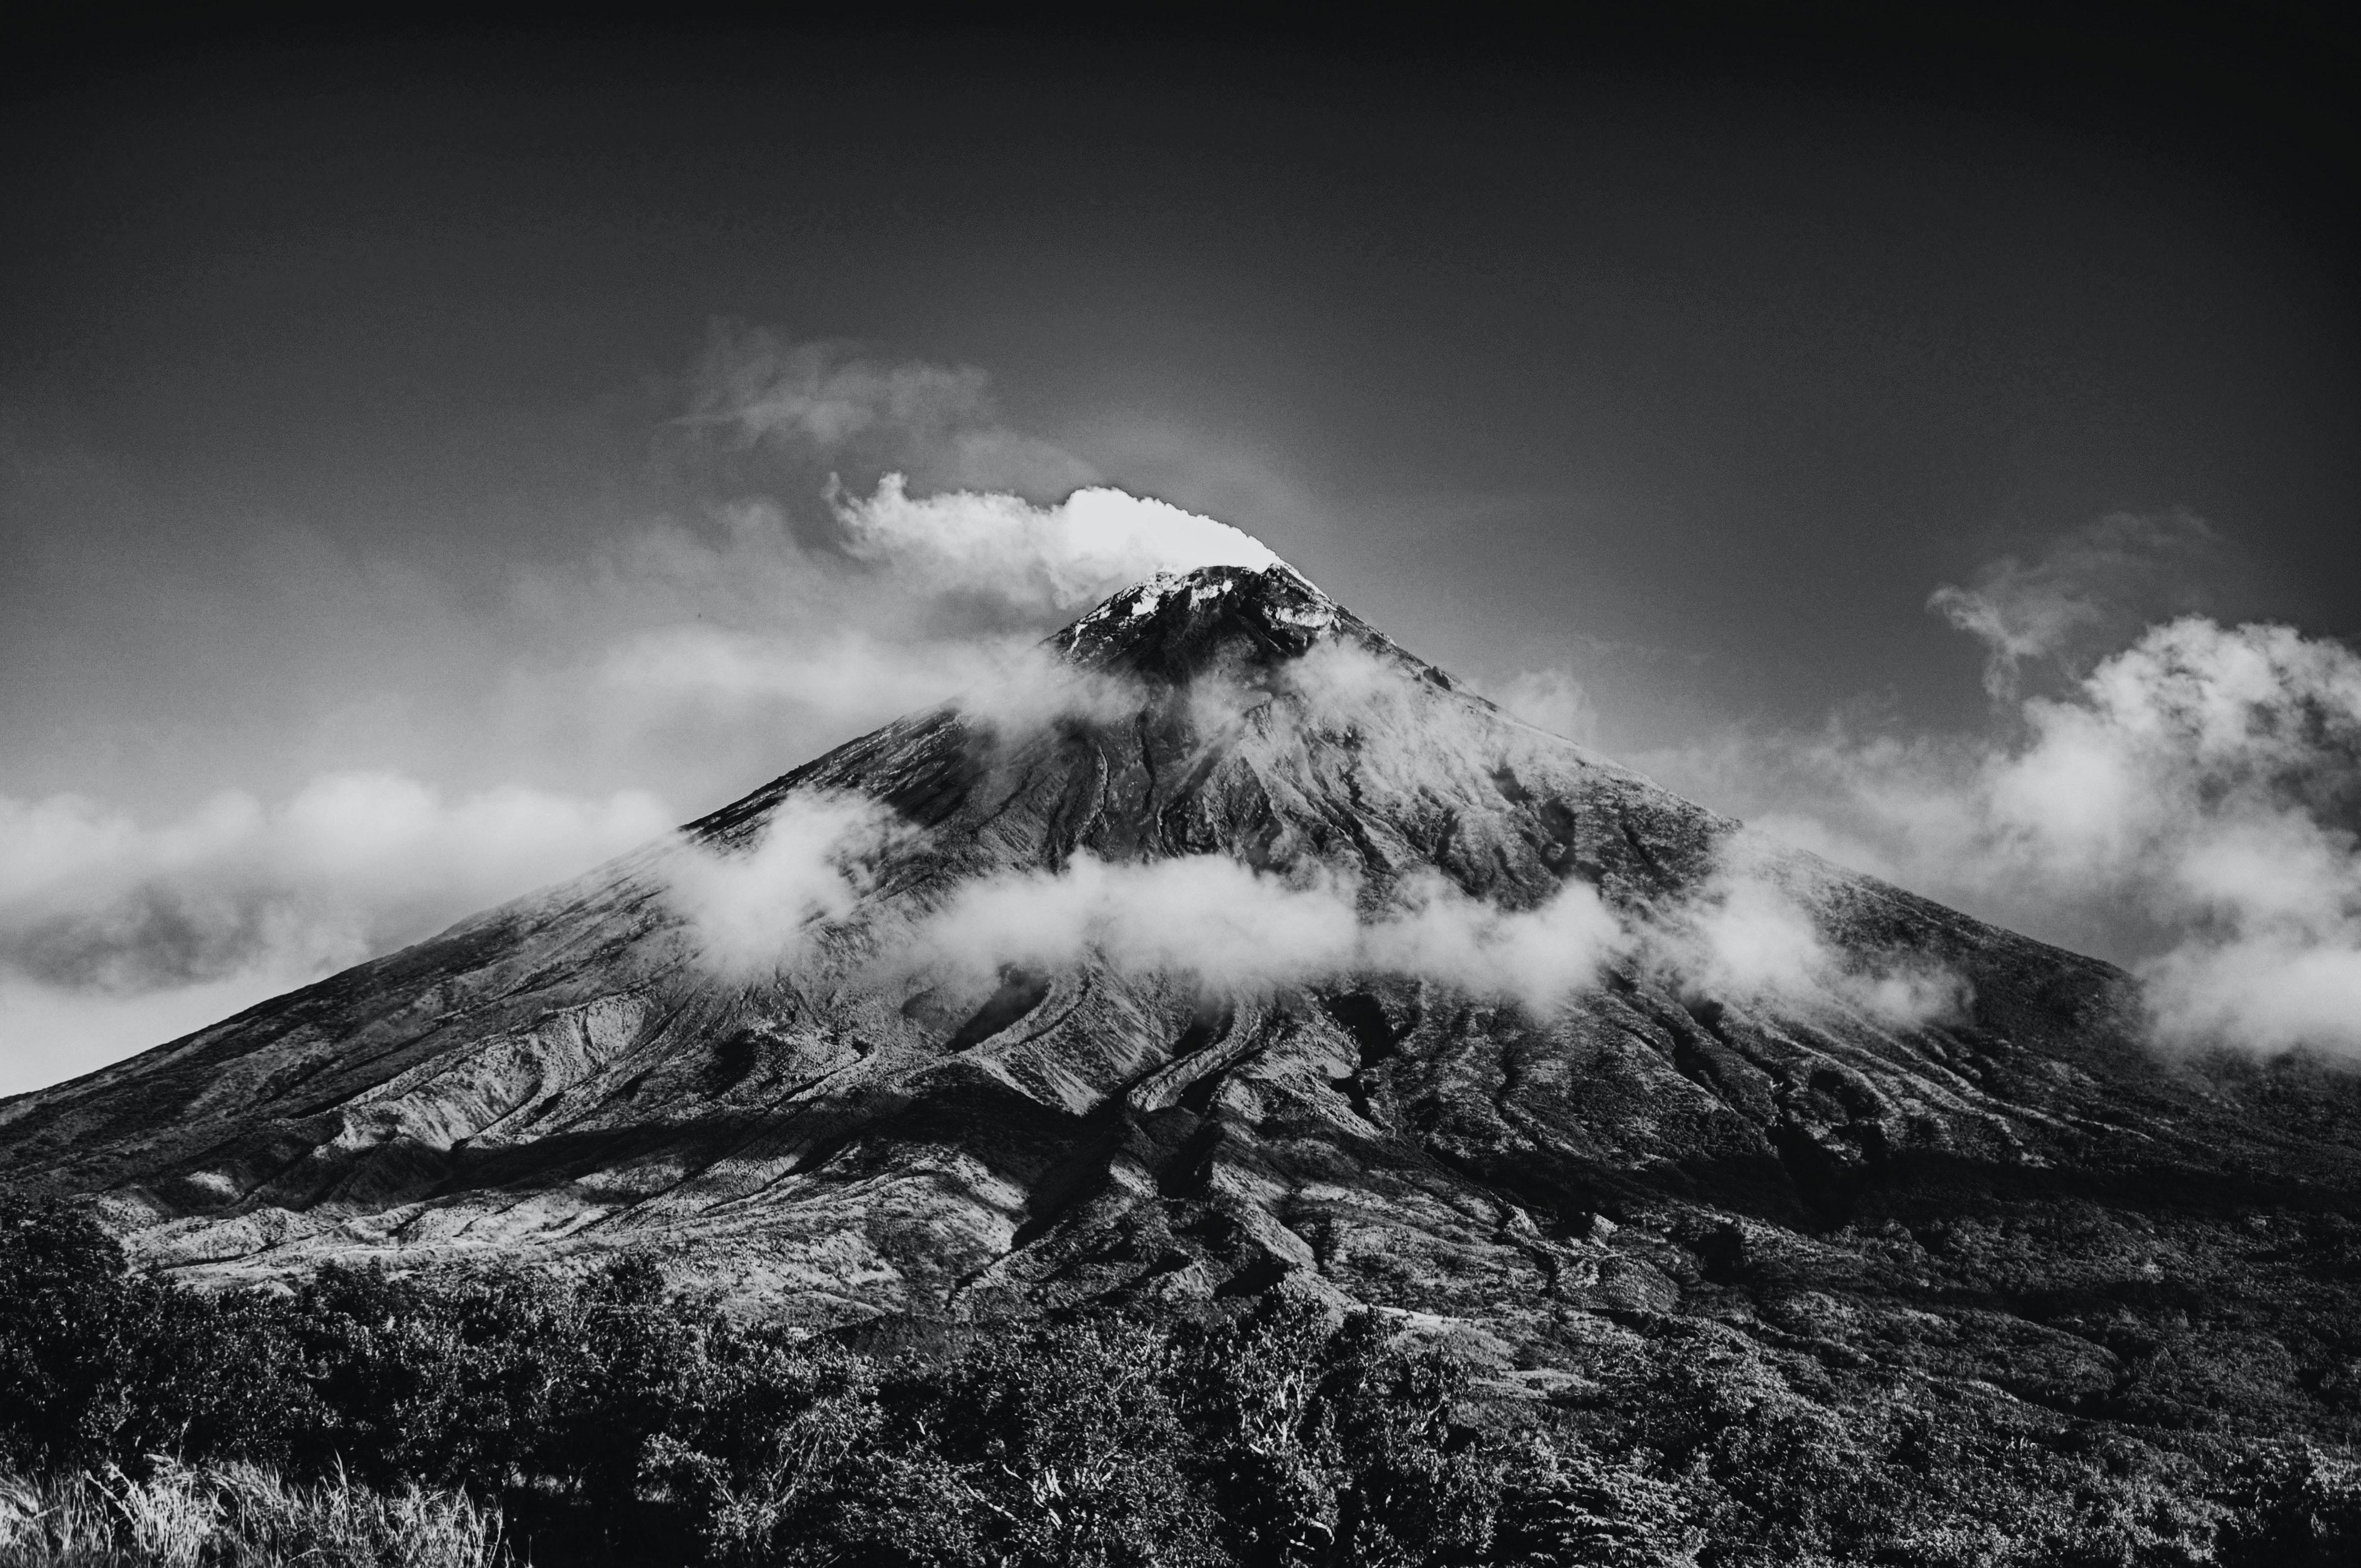 Grayscale photo of volcano · free stock photo